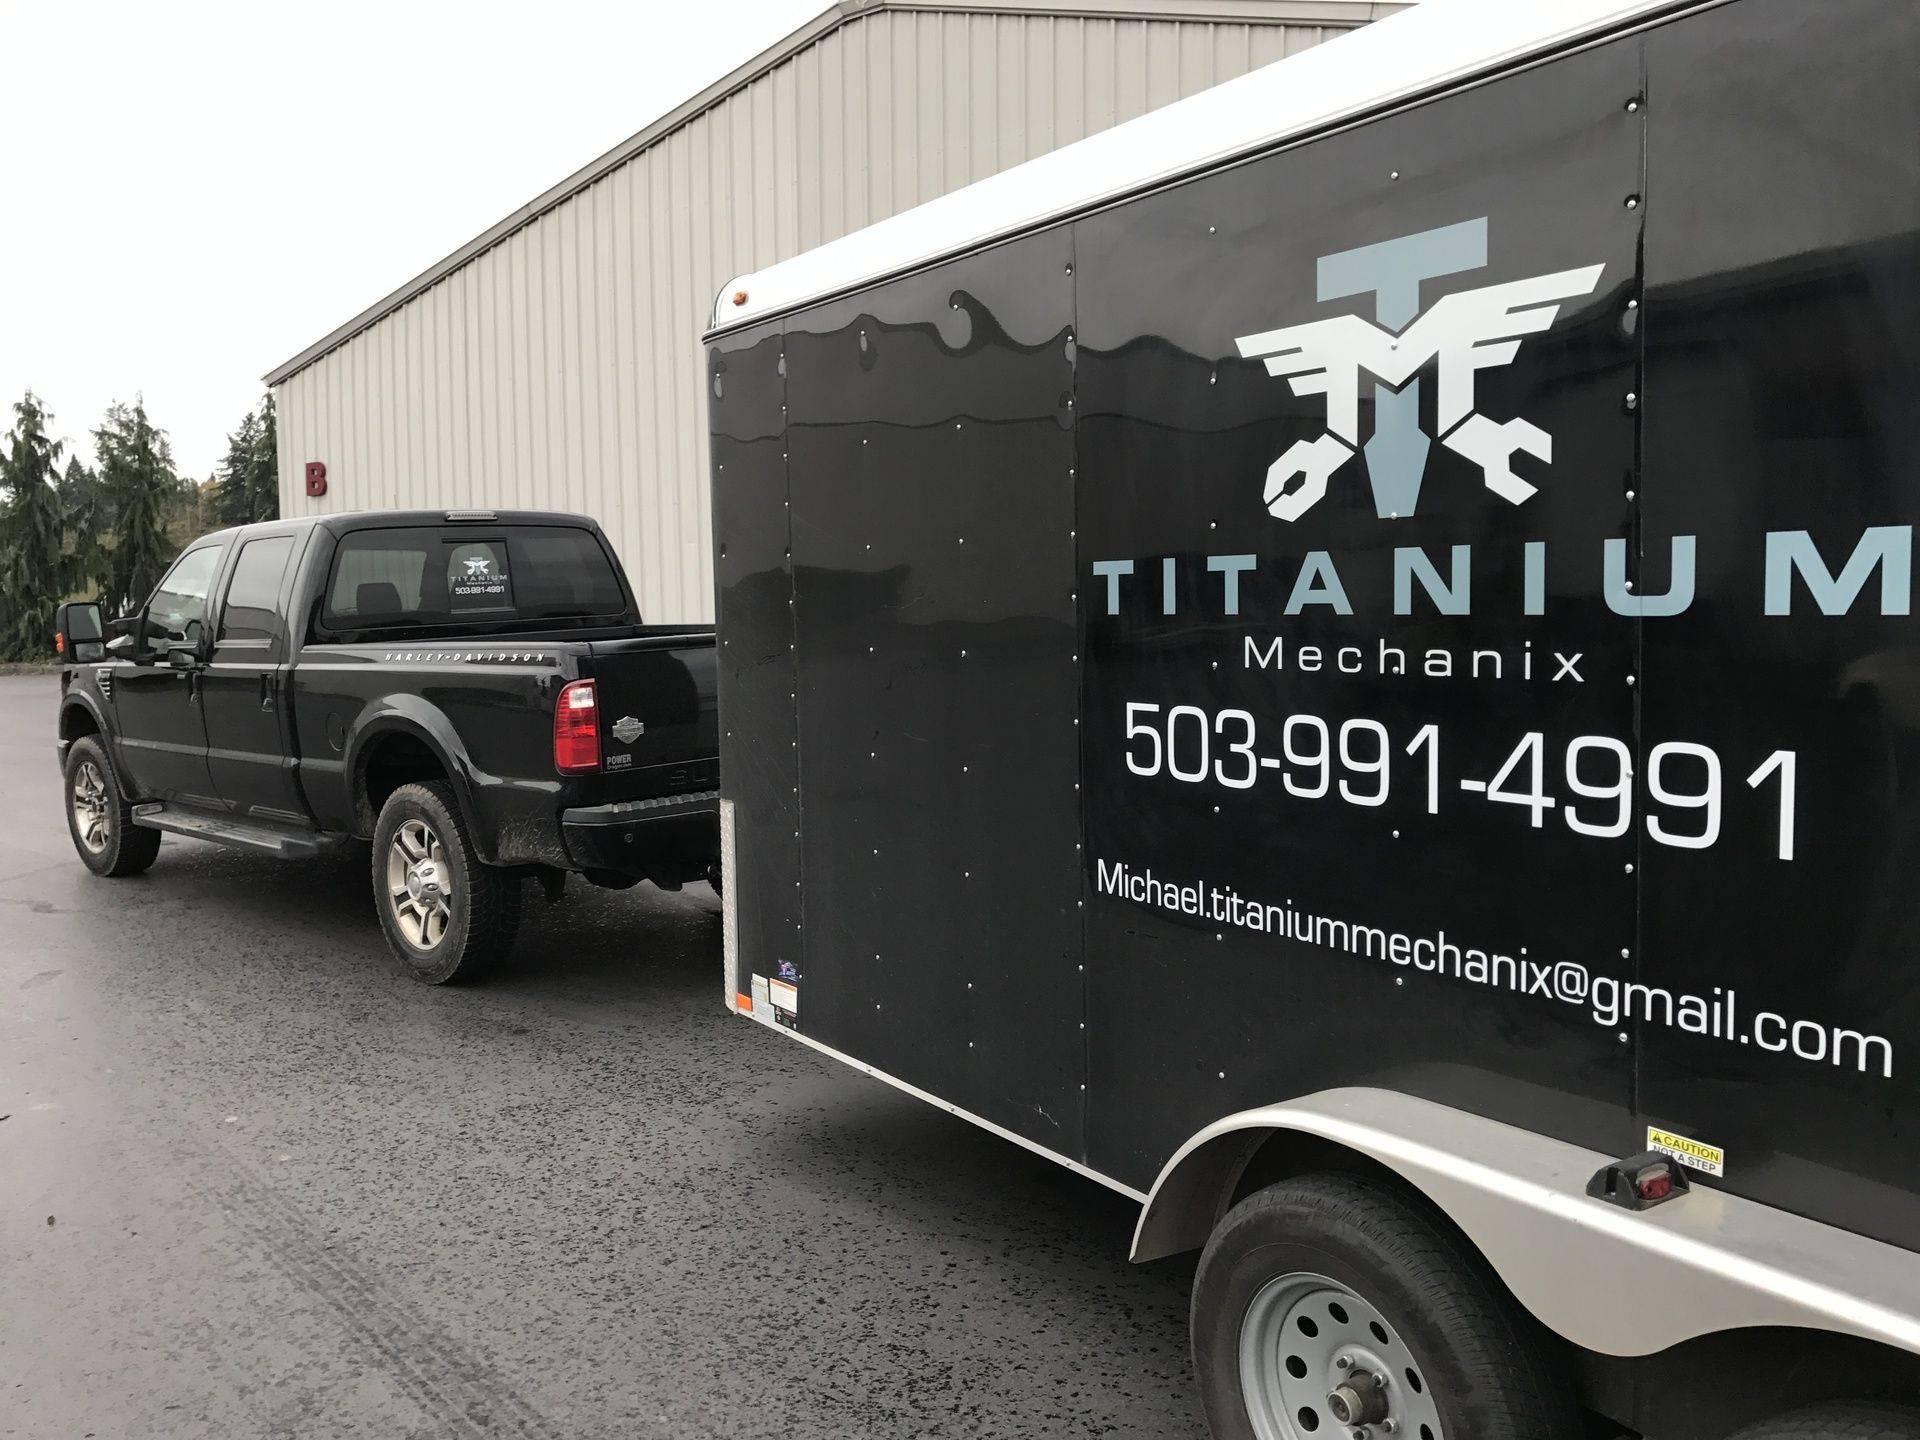 Jiffy Lube Hours Sunday >> Titanium Mechanix in Salem, OR 97303 - ChamberofCommerce.com